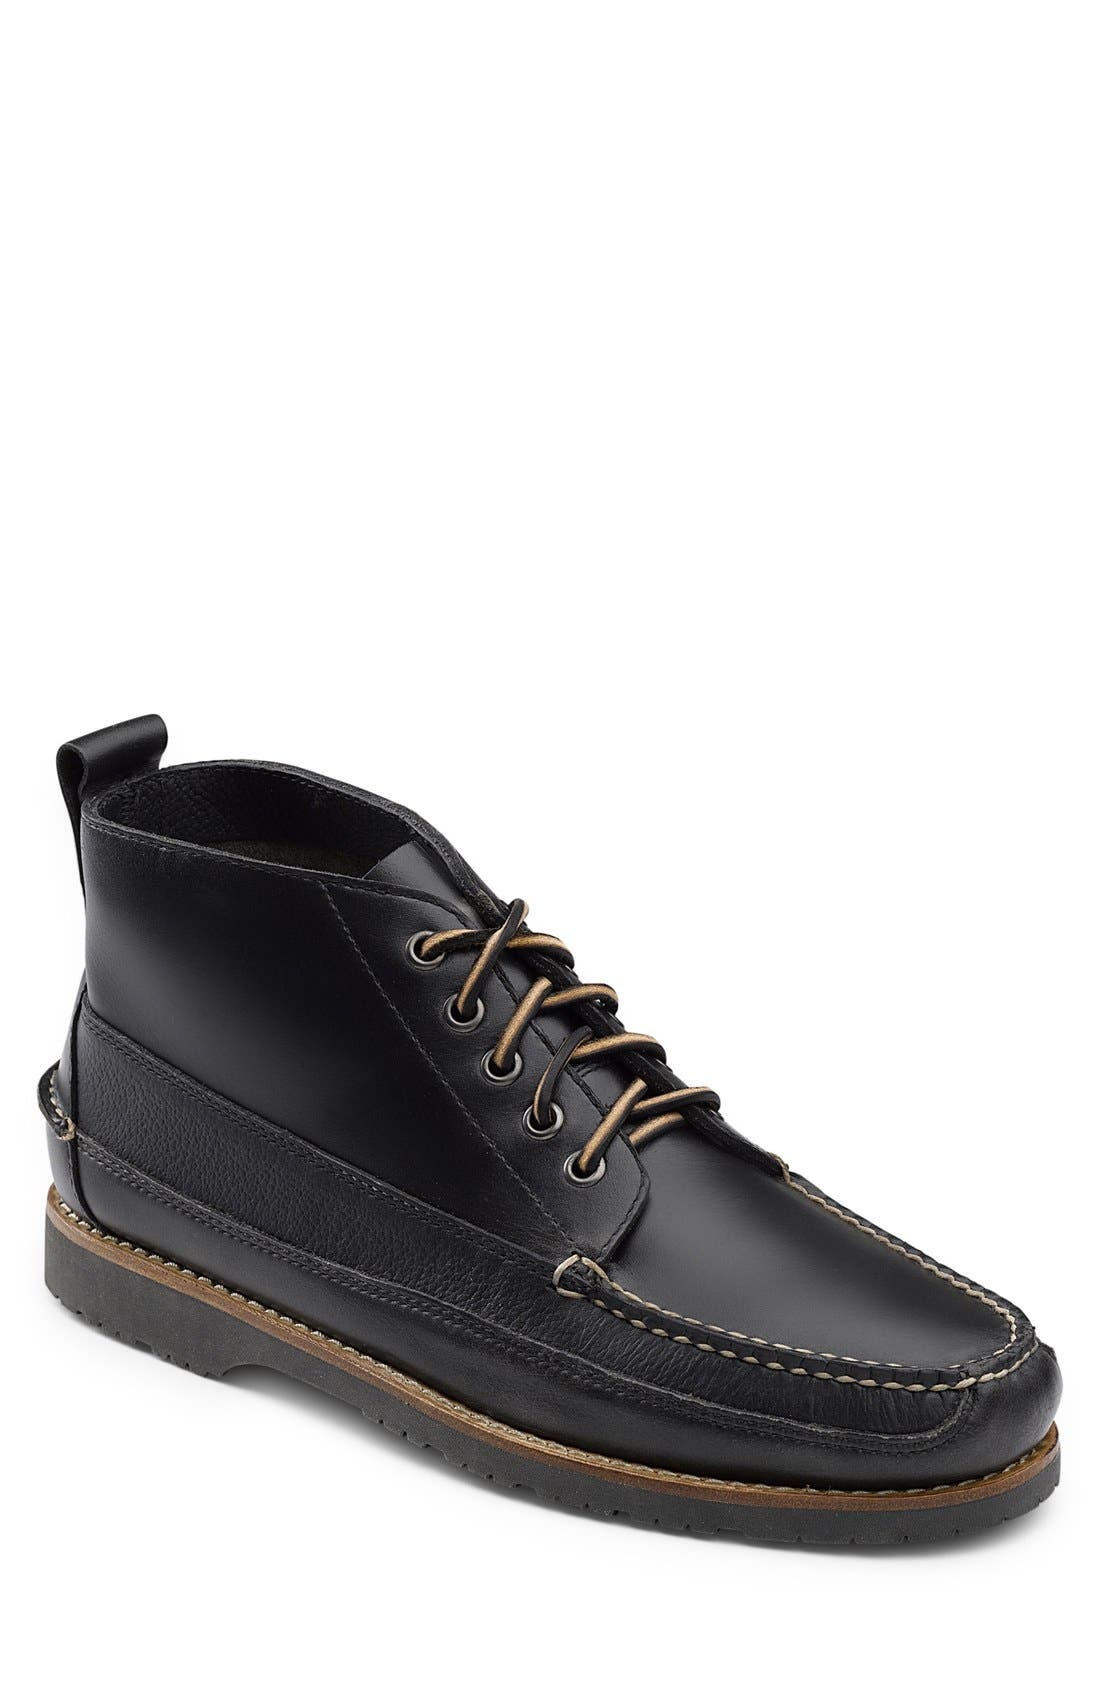 'Scott' Chukka Boot,                         Main,                         color,